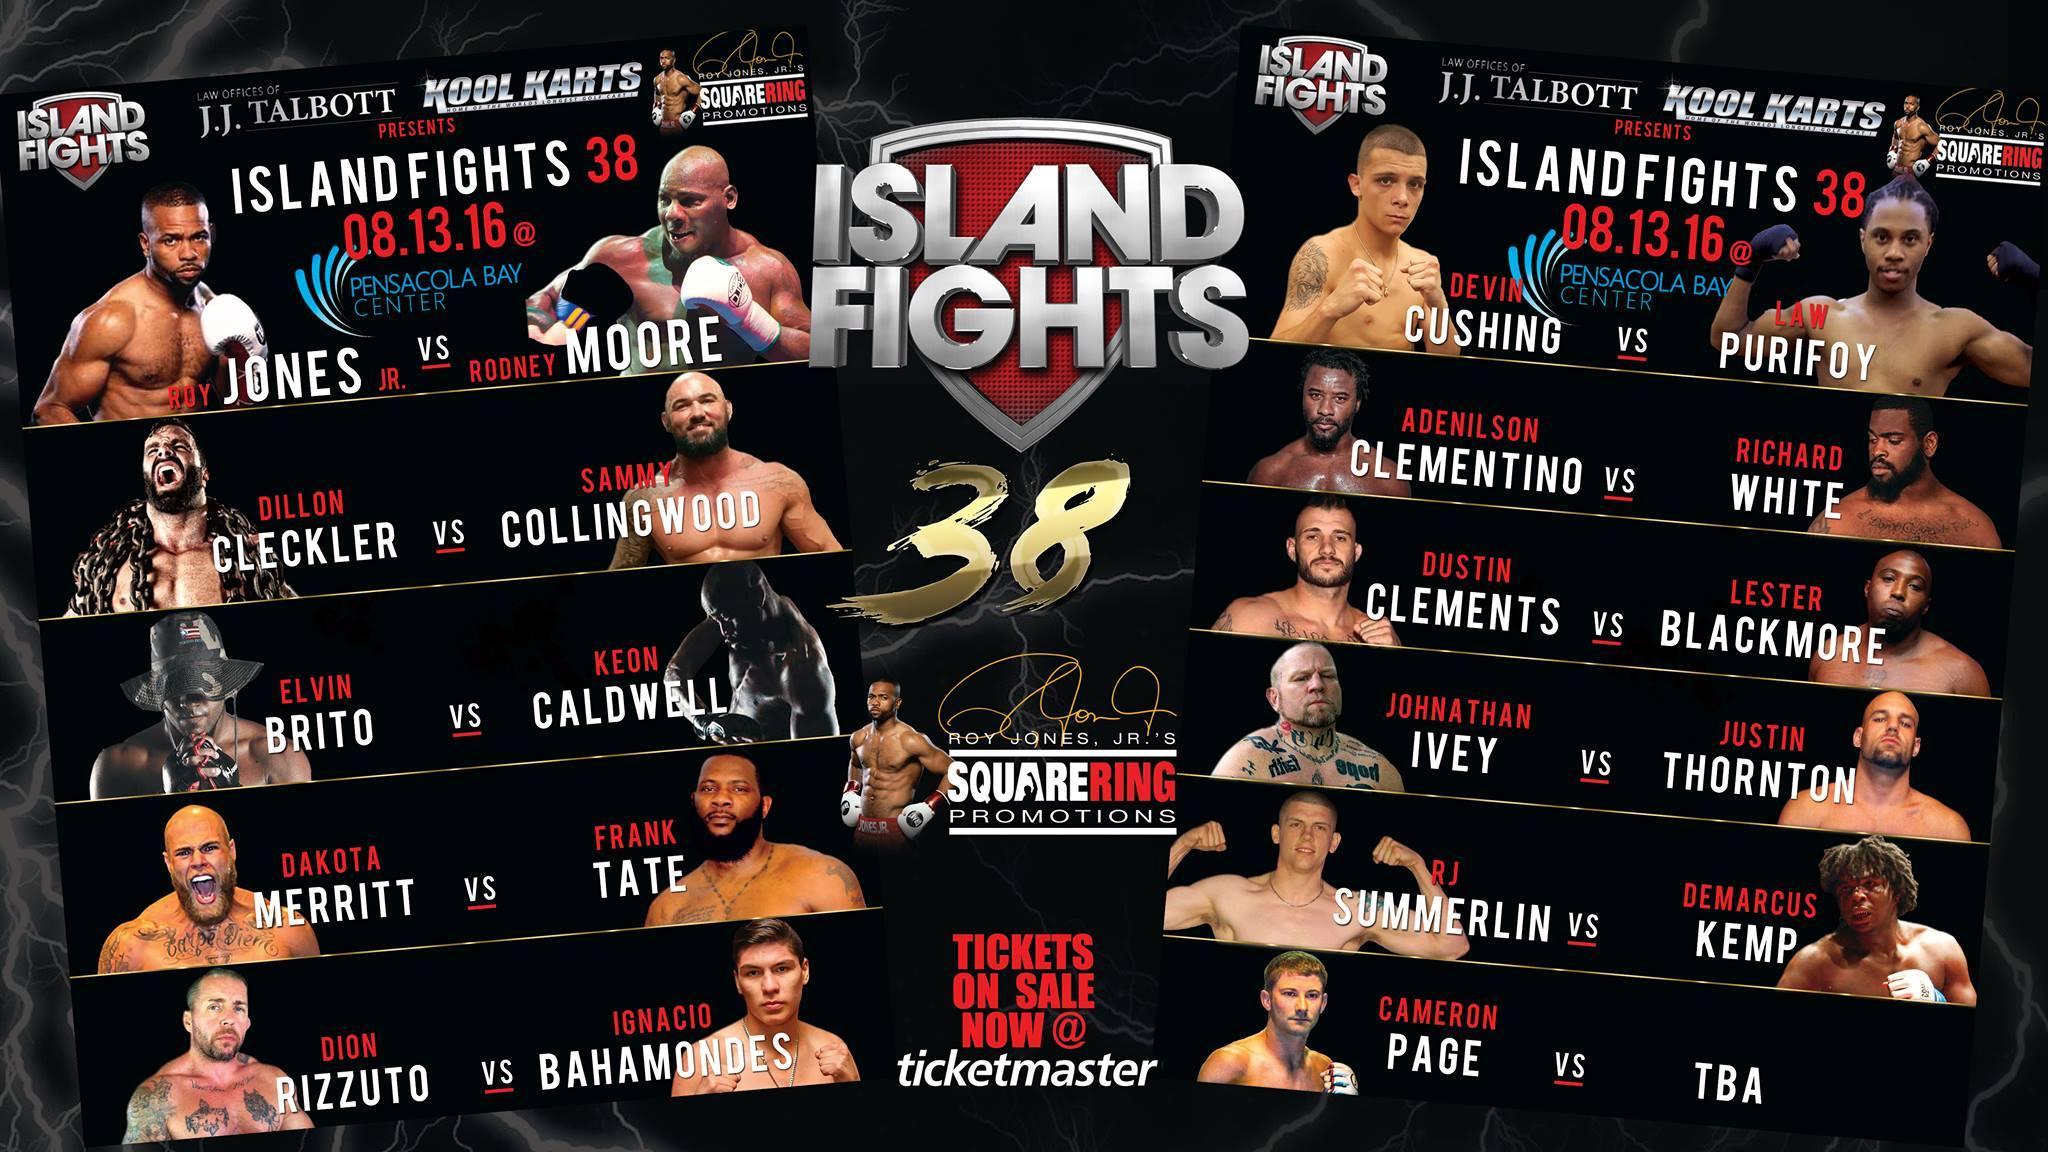 IslandFights38